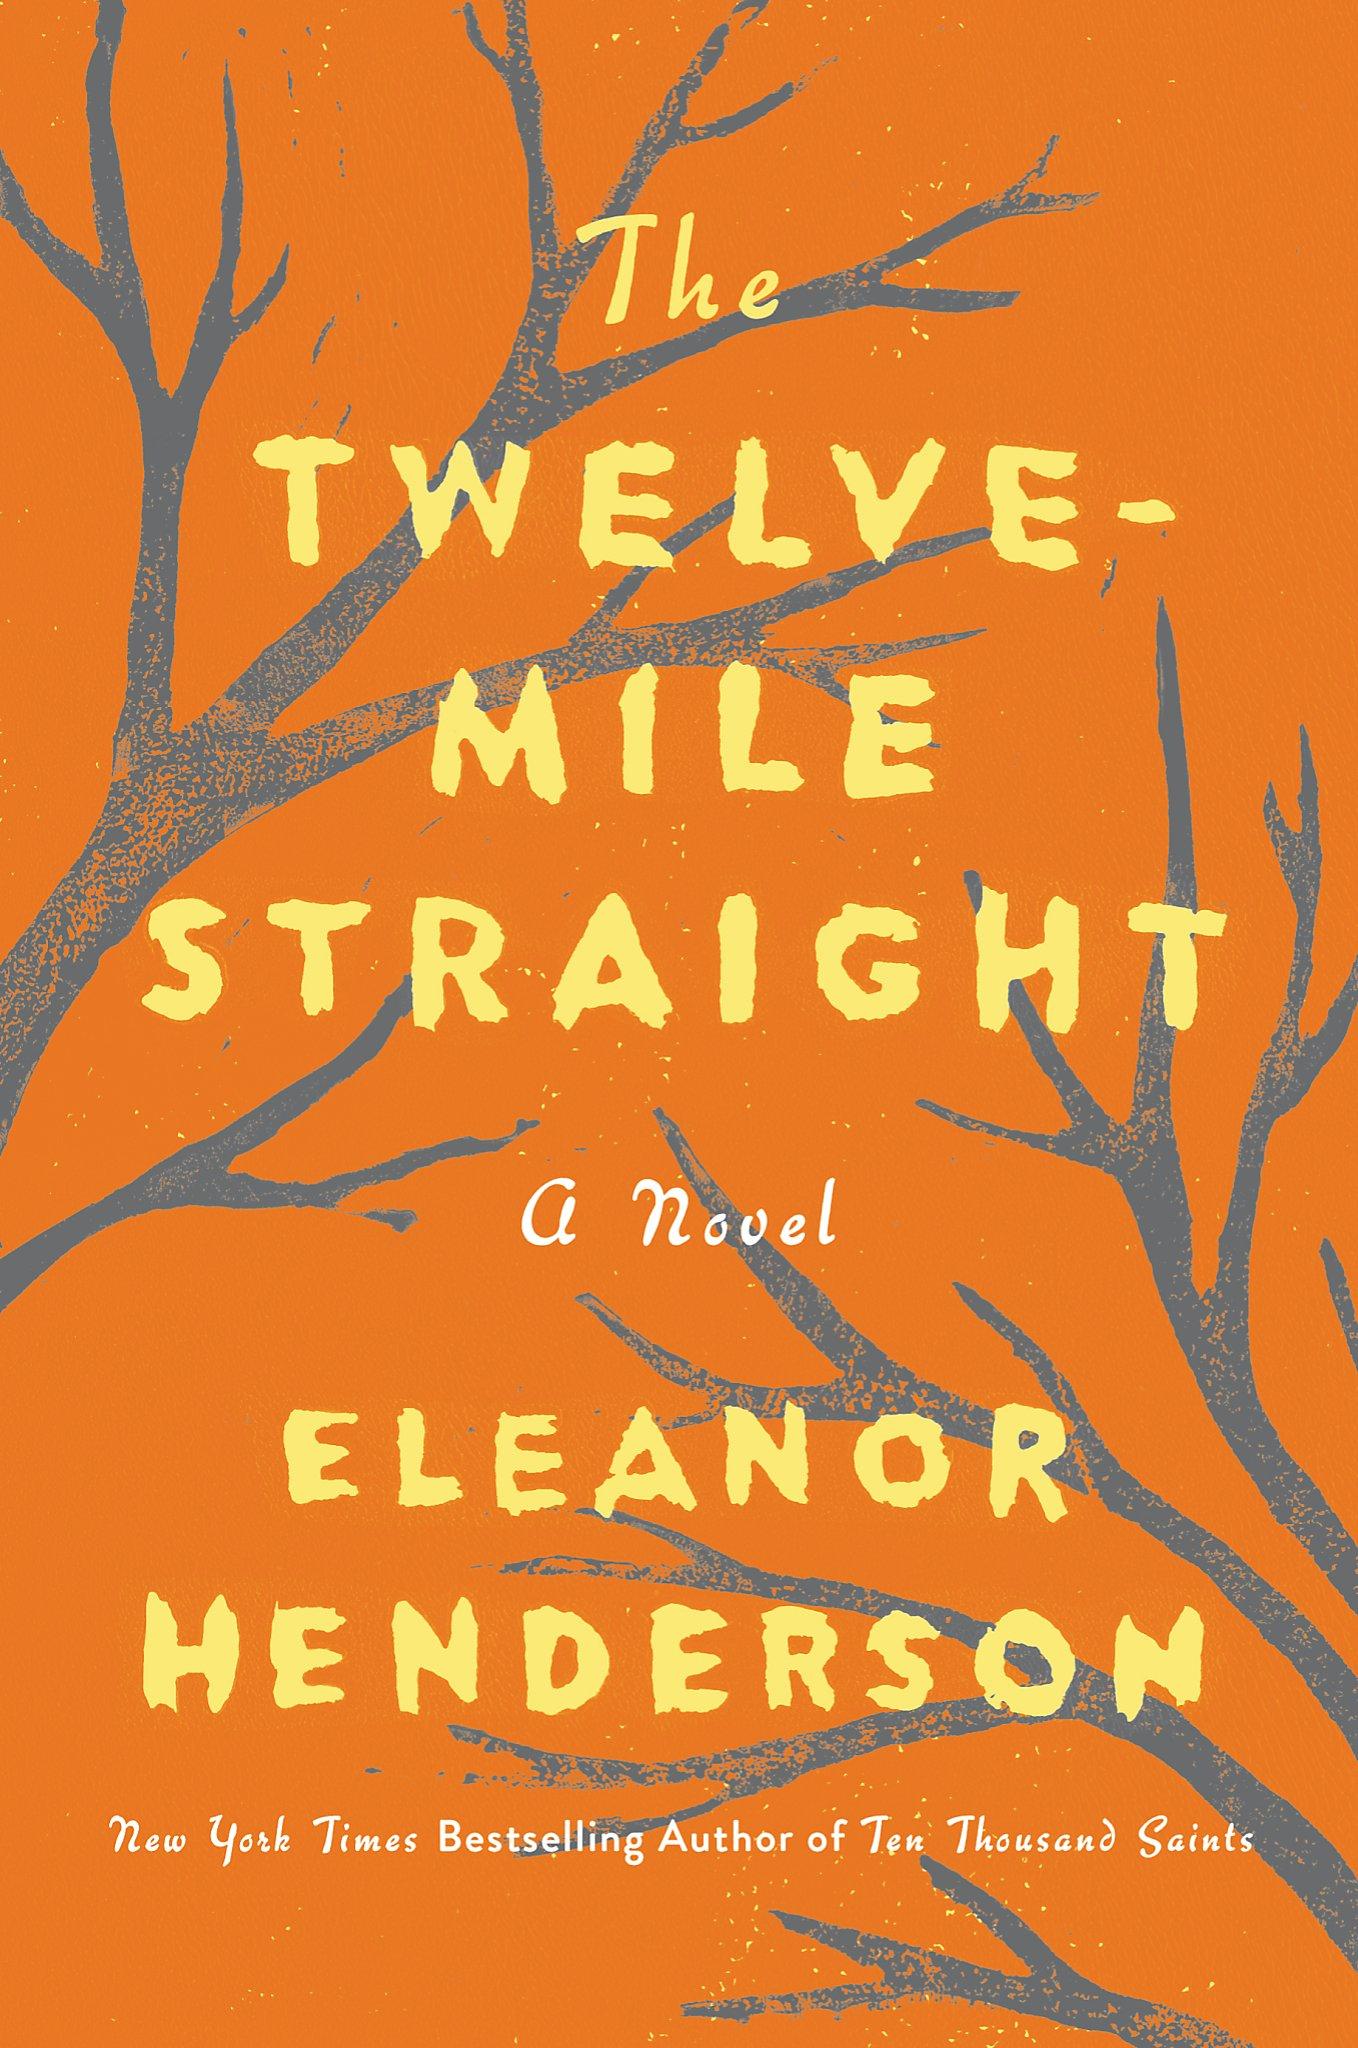 'The Twelve-Mile Straight,' by Eleanor Henderson - SFGate